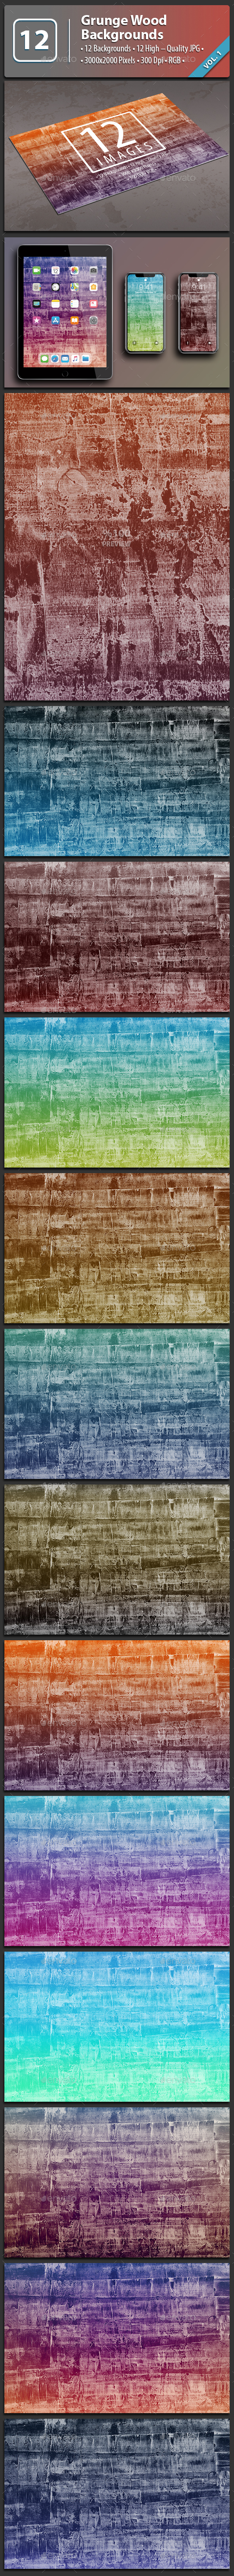 12 Grunge Wood Backgrounds - Patterns Backgrounds